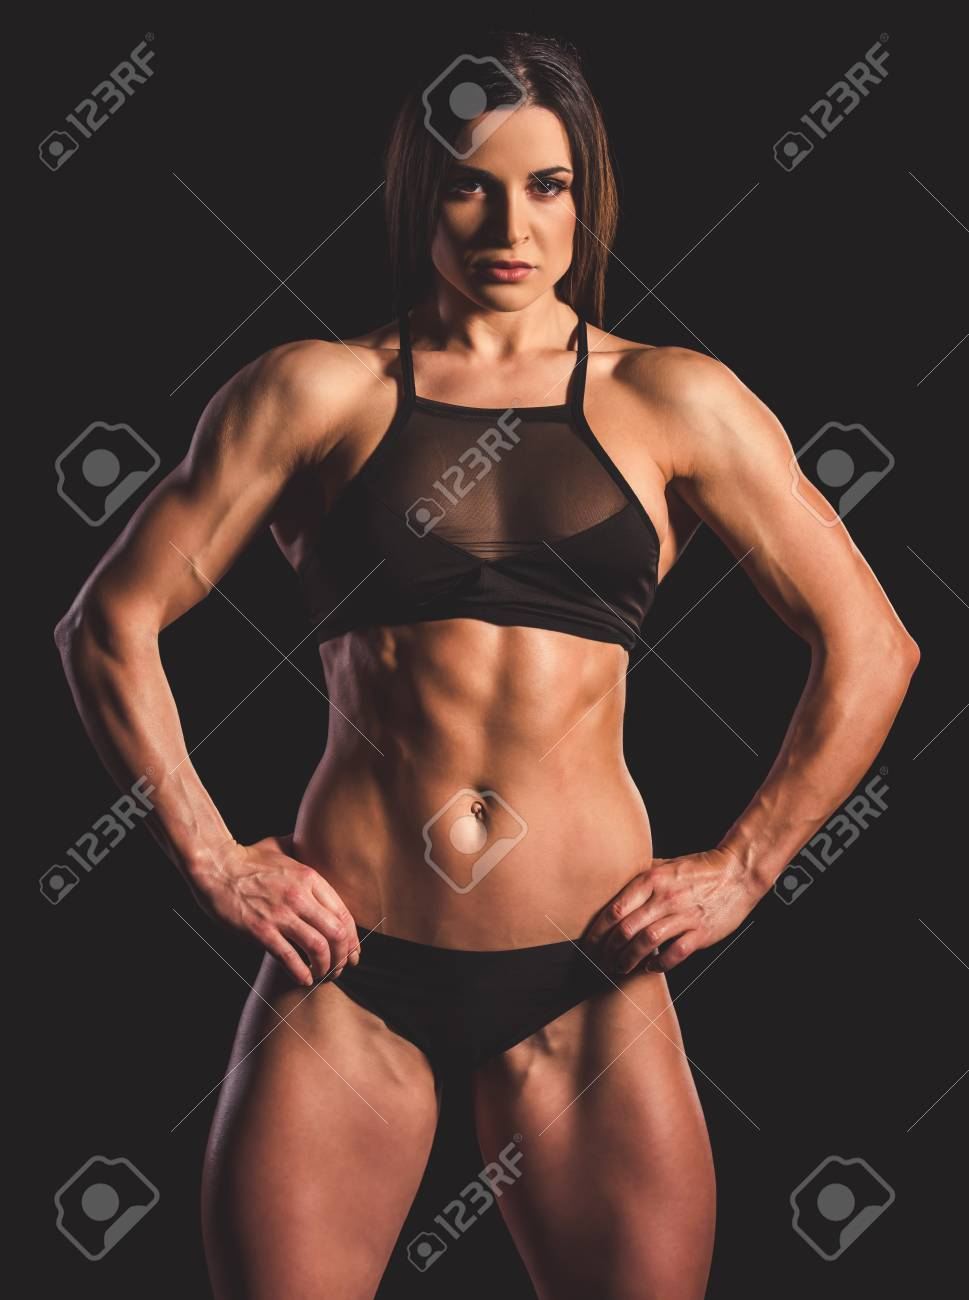 Beautiful strong muscular woman in black underwear on dark background Stock  Photo - 73399135 c19dc1145